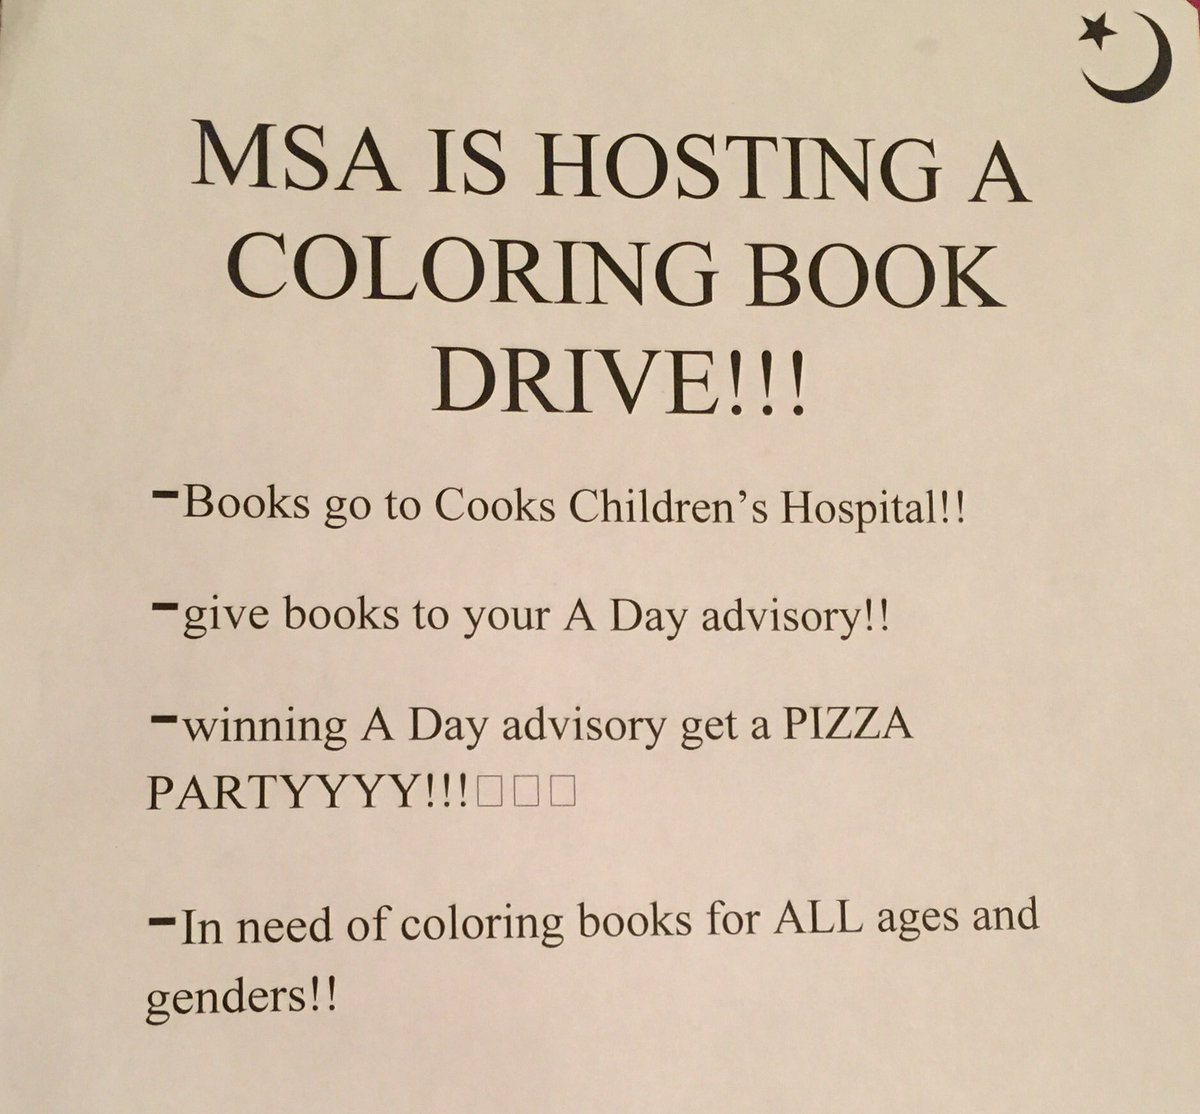 Childrens hospital coloring book - 0 Replies 1 Retweet 2 Likes